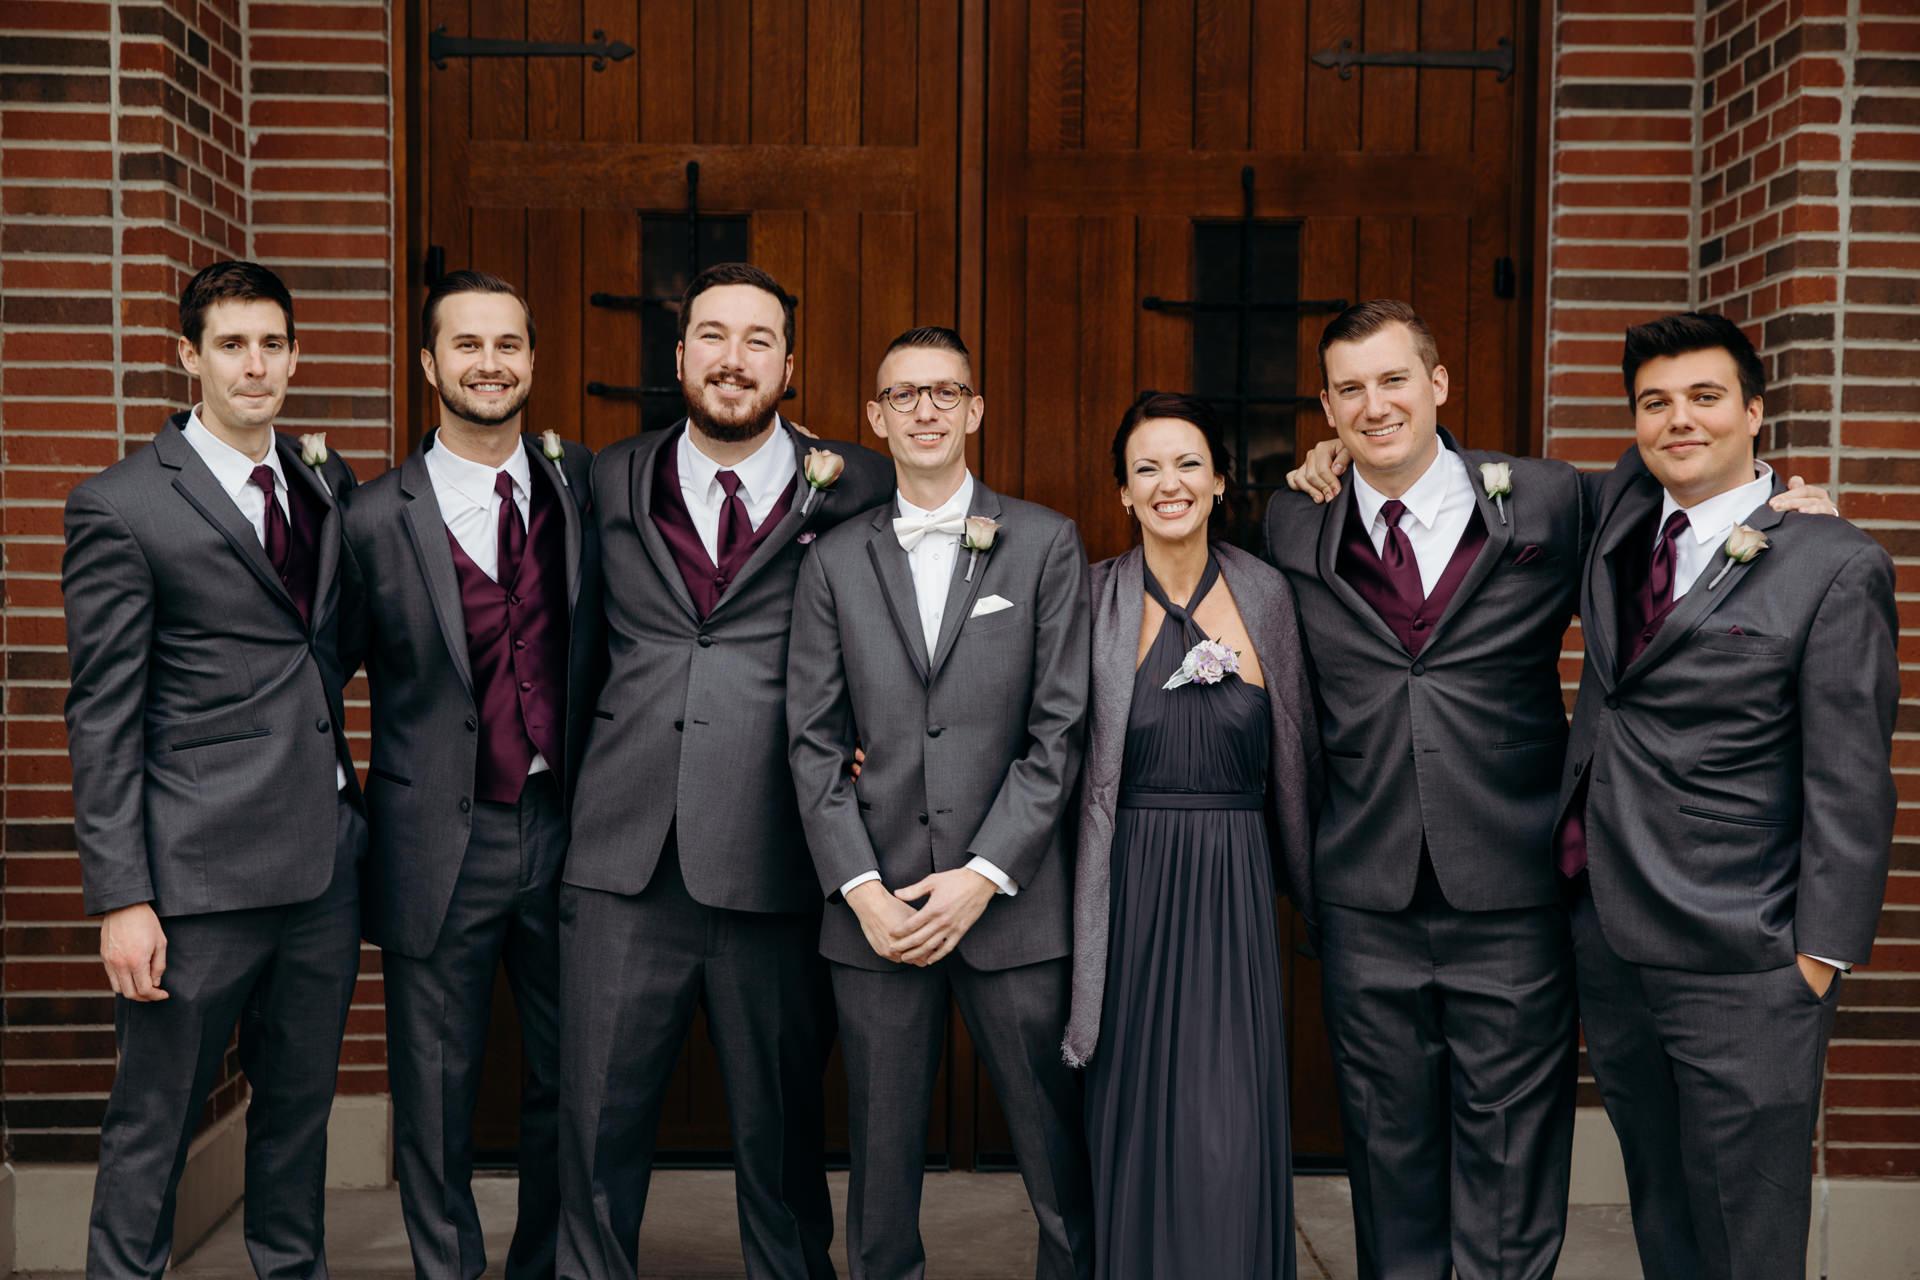 Armory wedding south bend grant beachy photography elkhart goshen -033.jpg